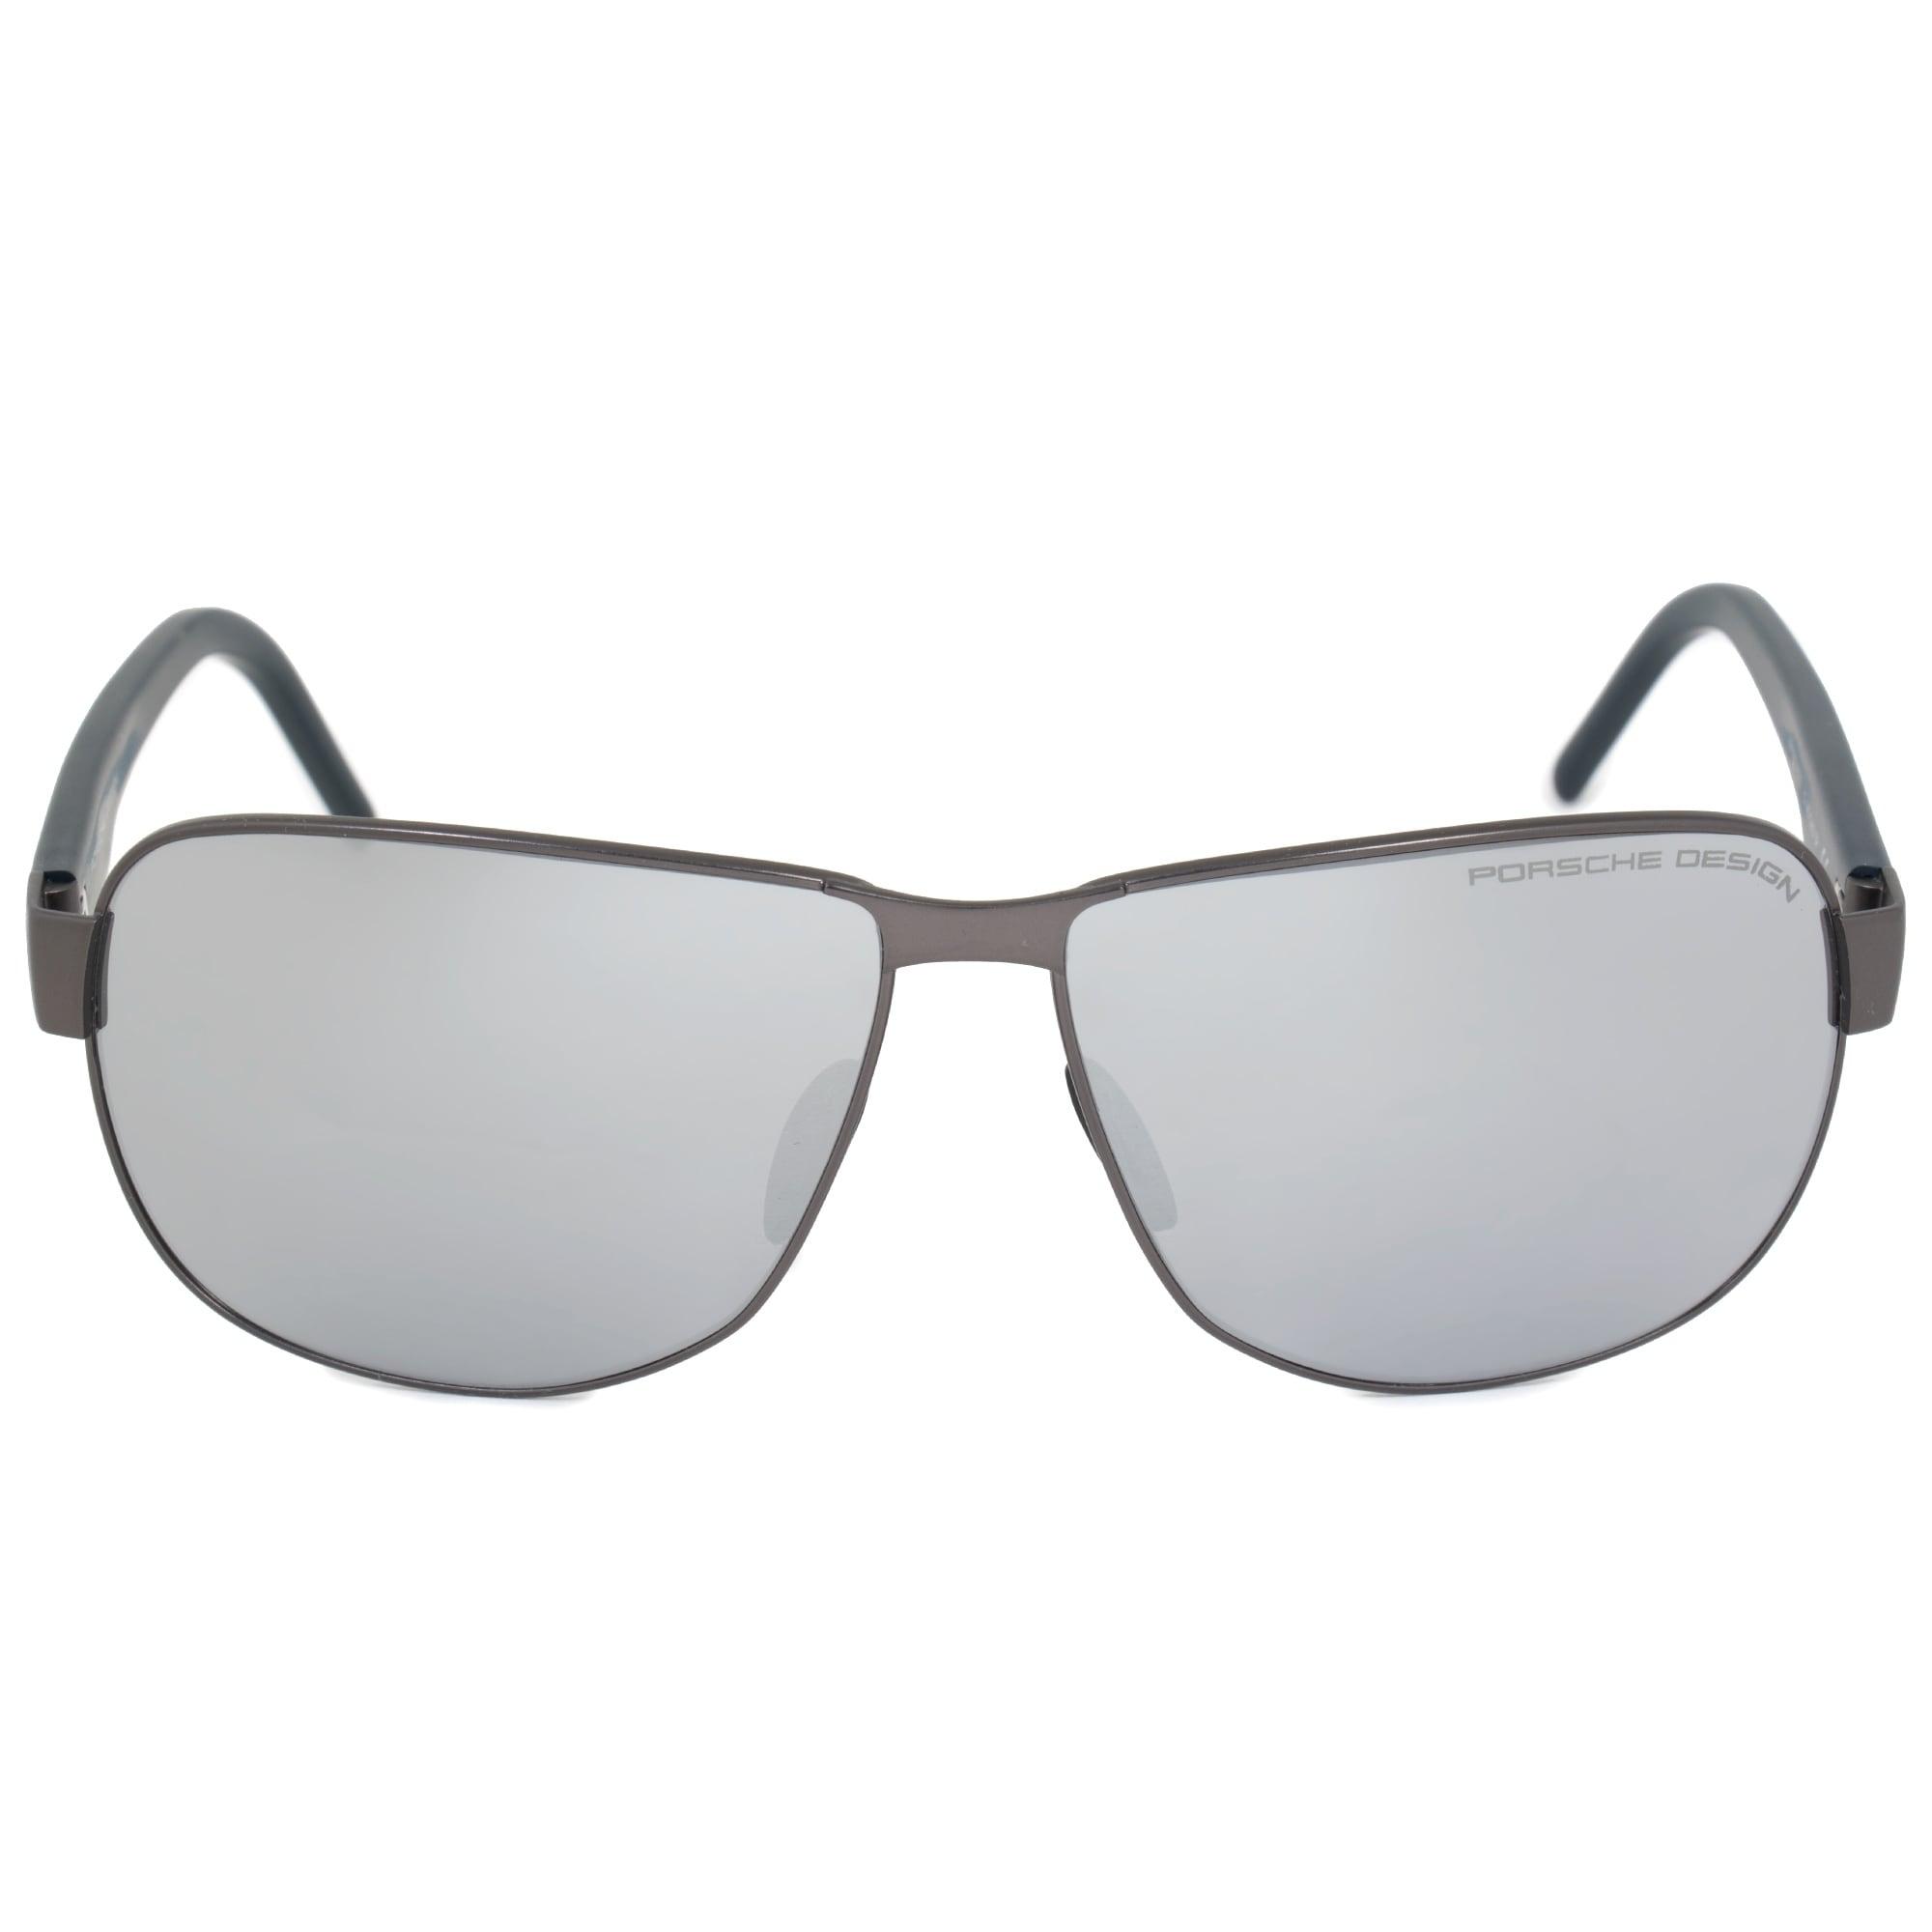 921d353fb834 Shop Porsche Design Design P8633 C 61 Aviator Sunglasses for Men ...